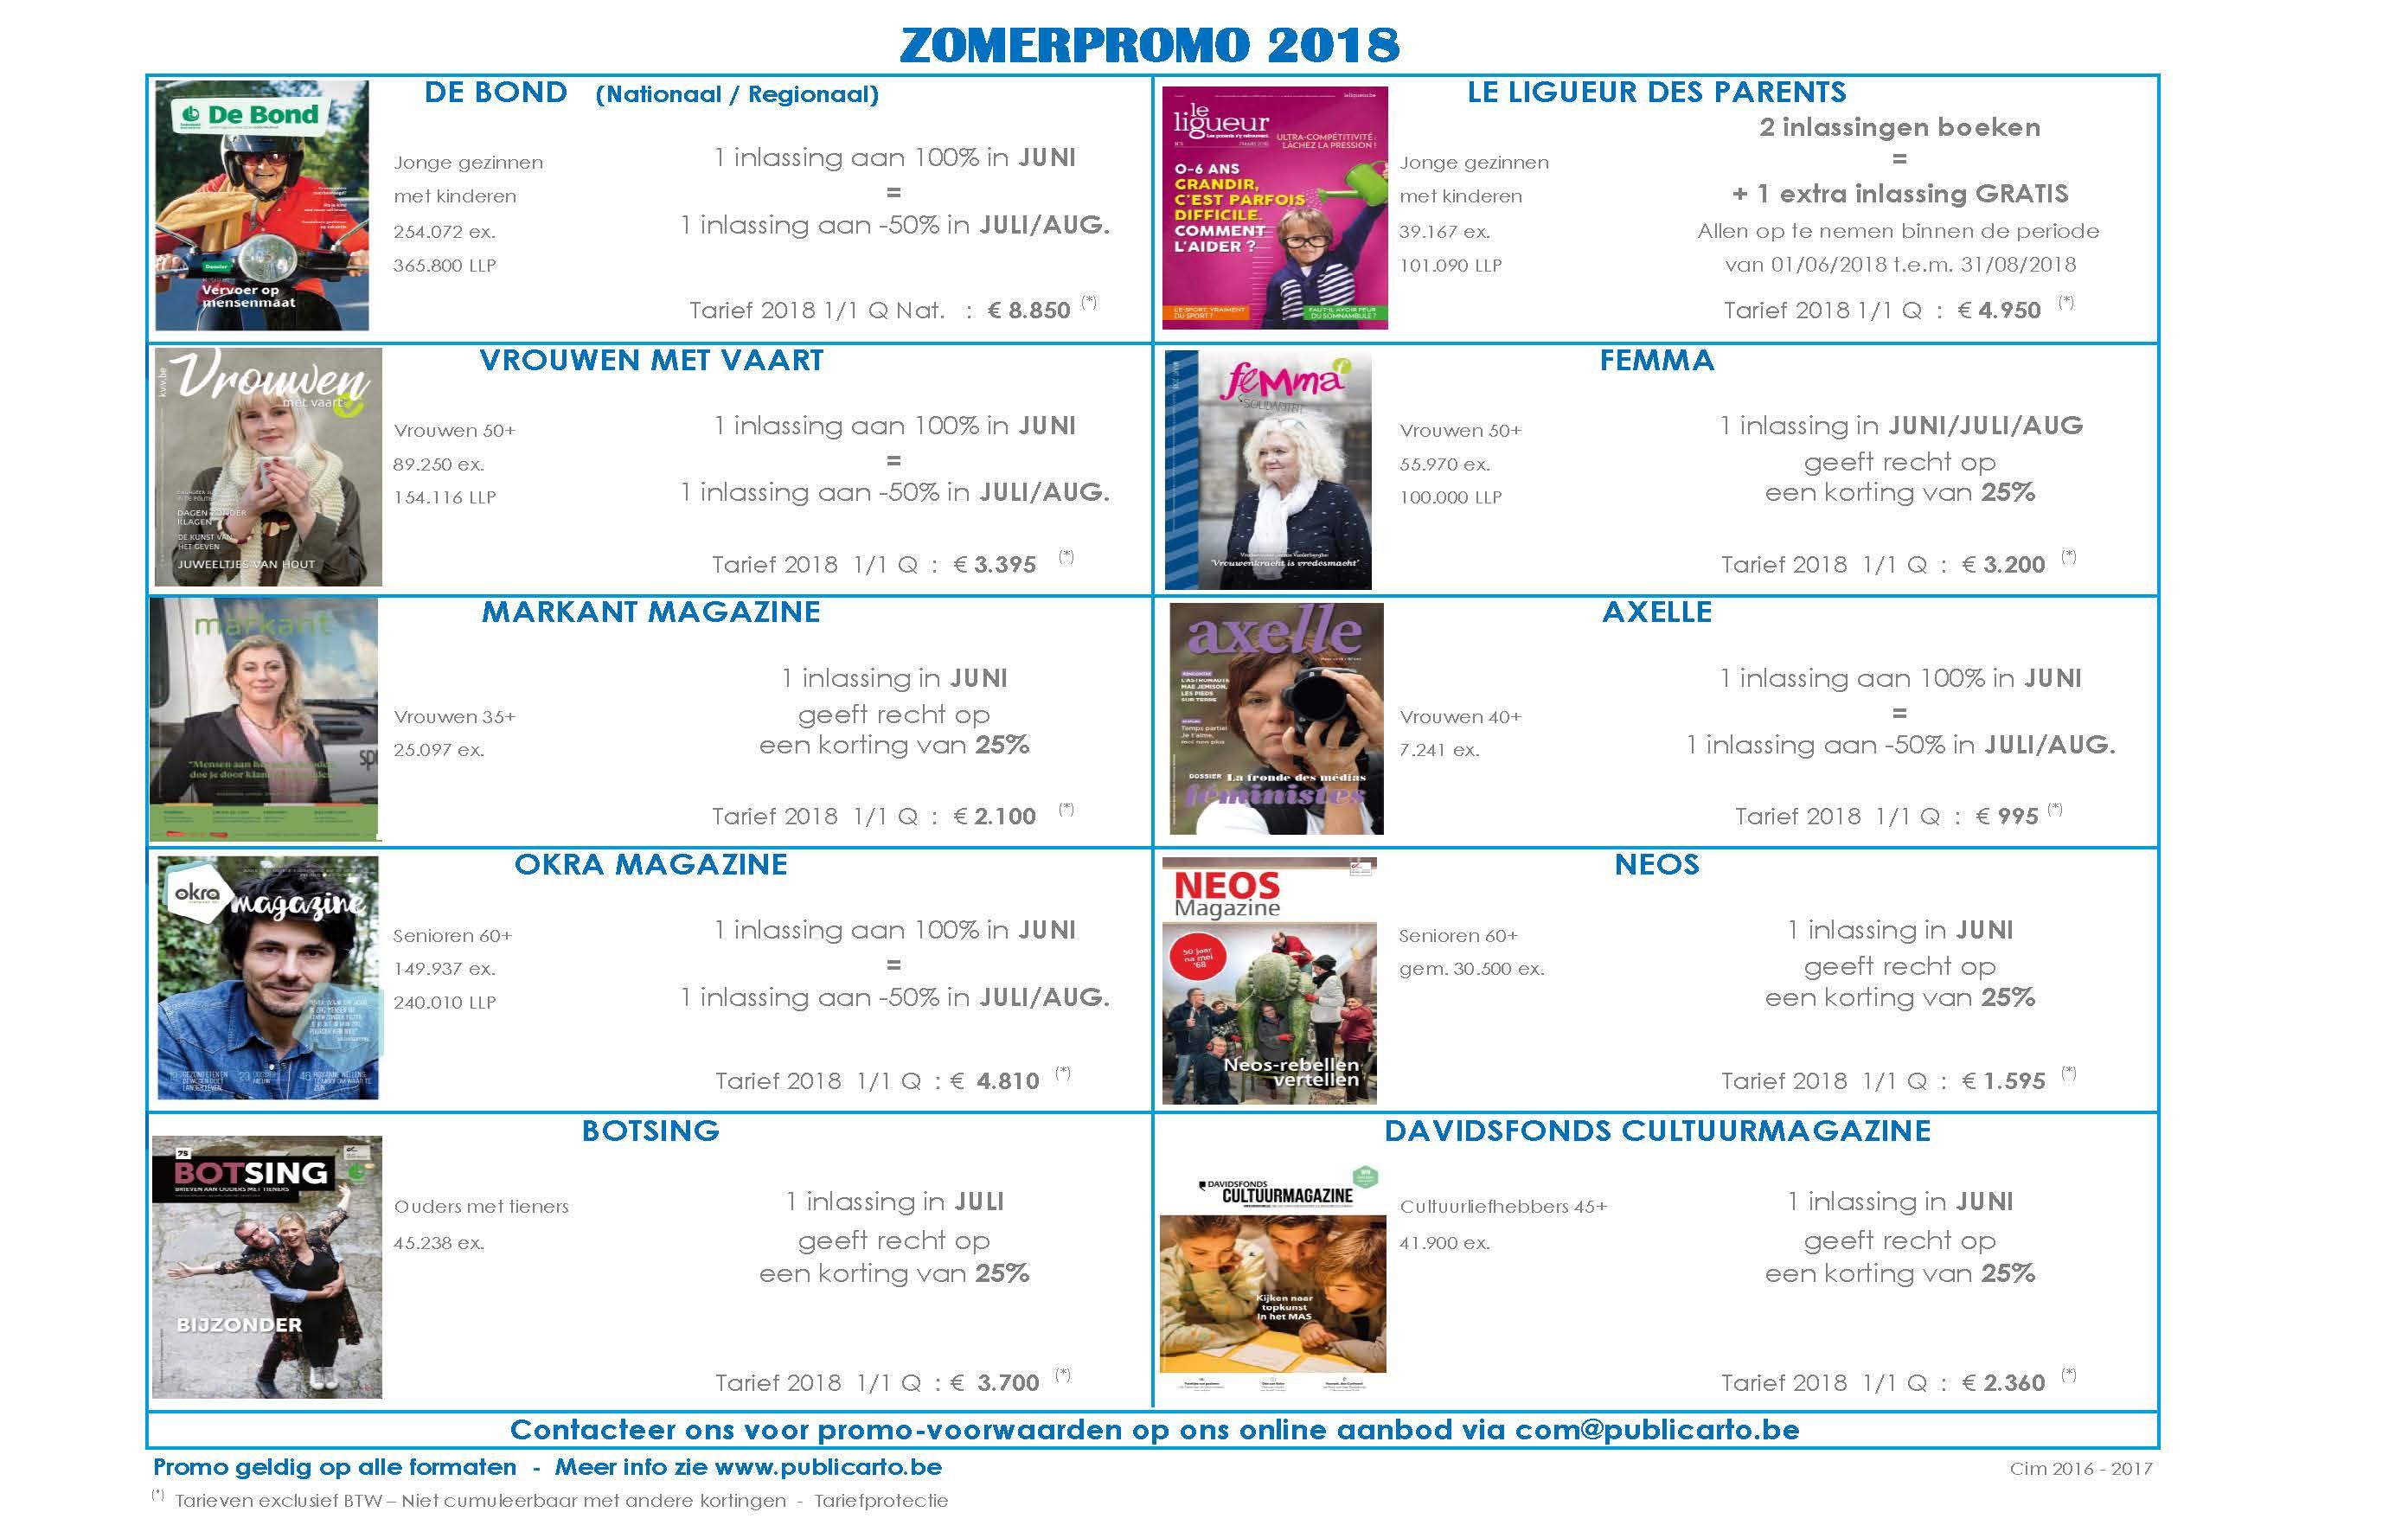 http://publicarto.be/app/uploads/Zomerpromo-2018-NL.pdf